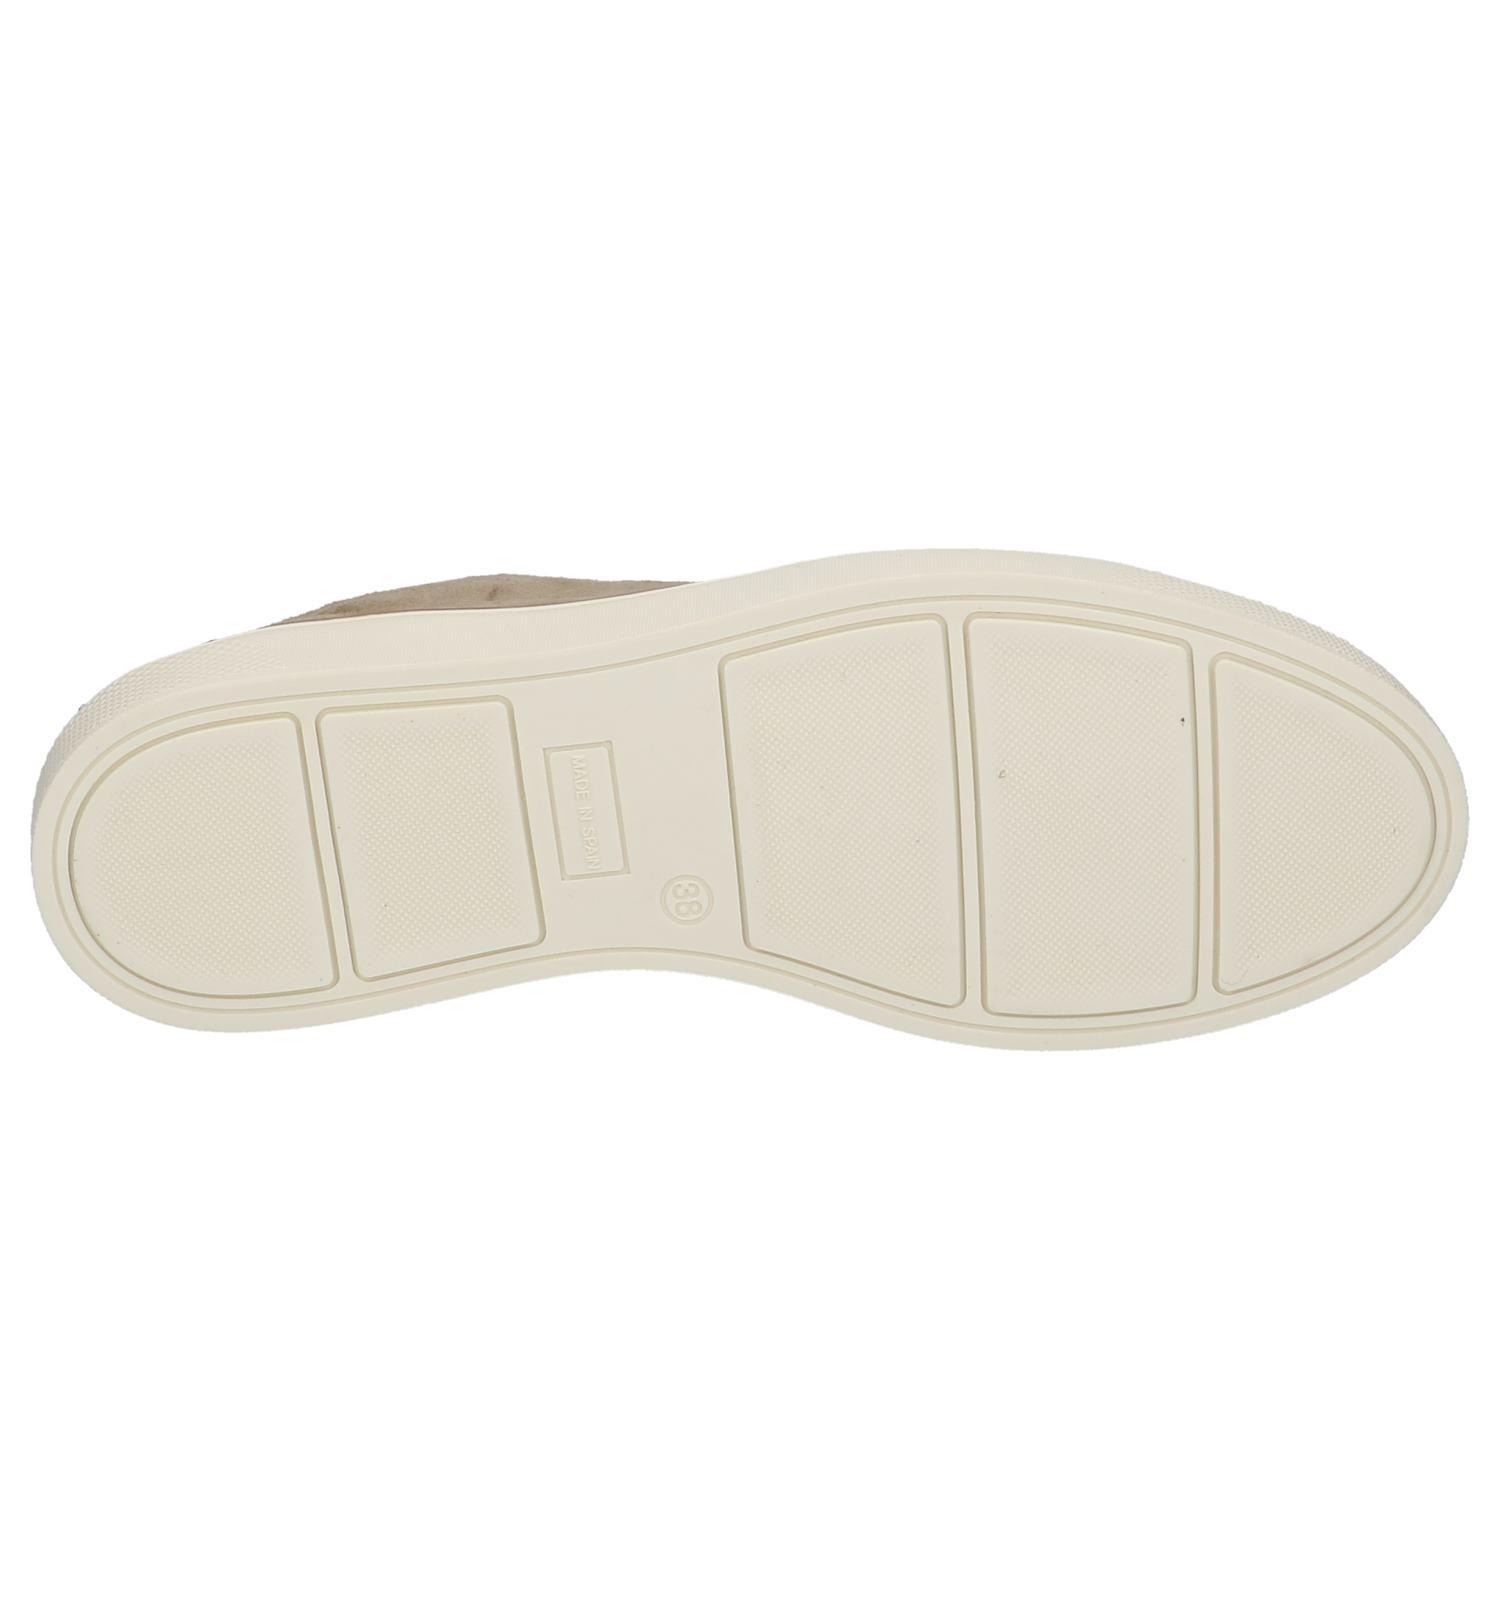 Kaki Torfs Hampton Bays Sneakers By zVqUMGpS